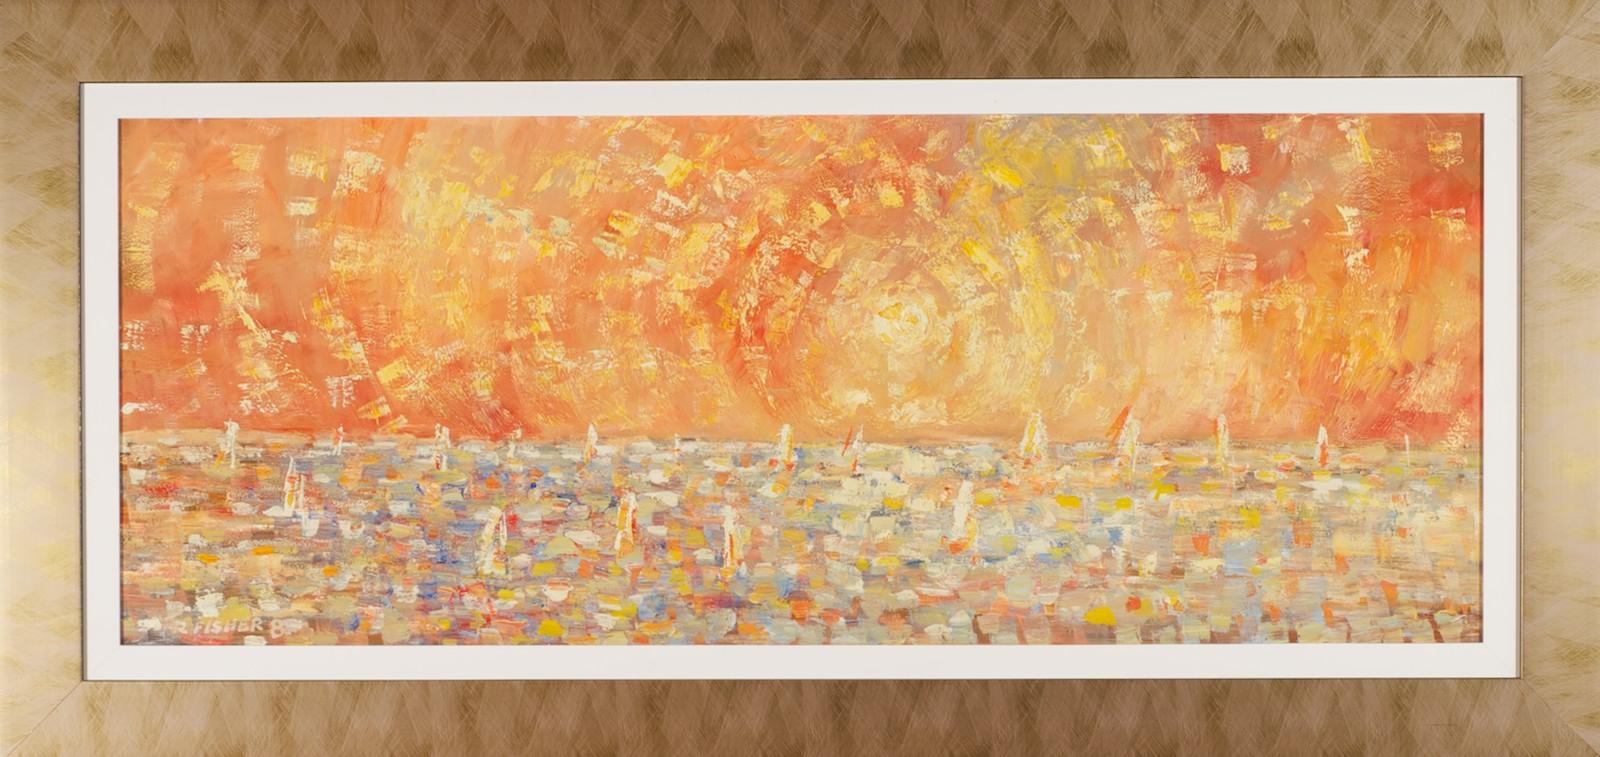 Robert Fisher 'Golden Seascape' 54cm x 112cm #8301